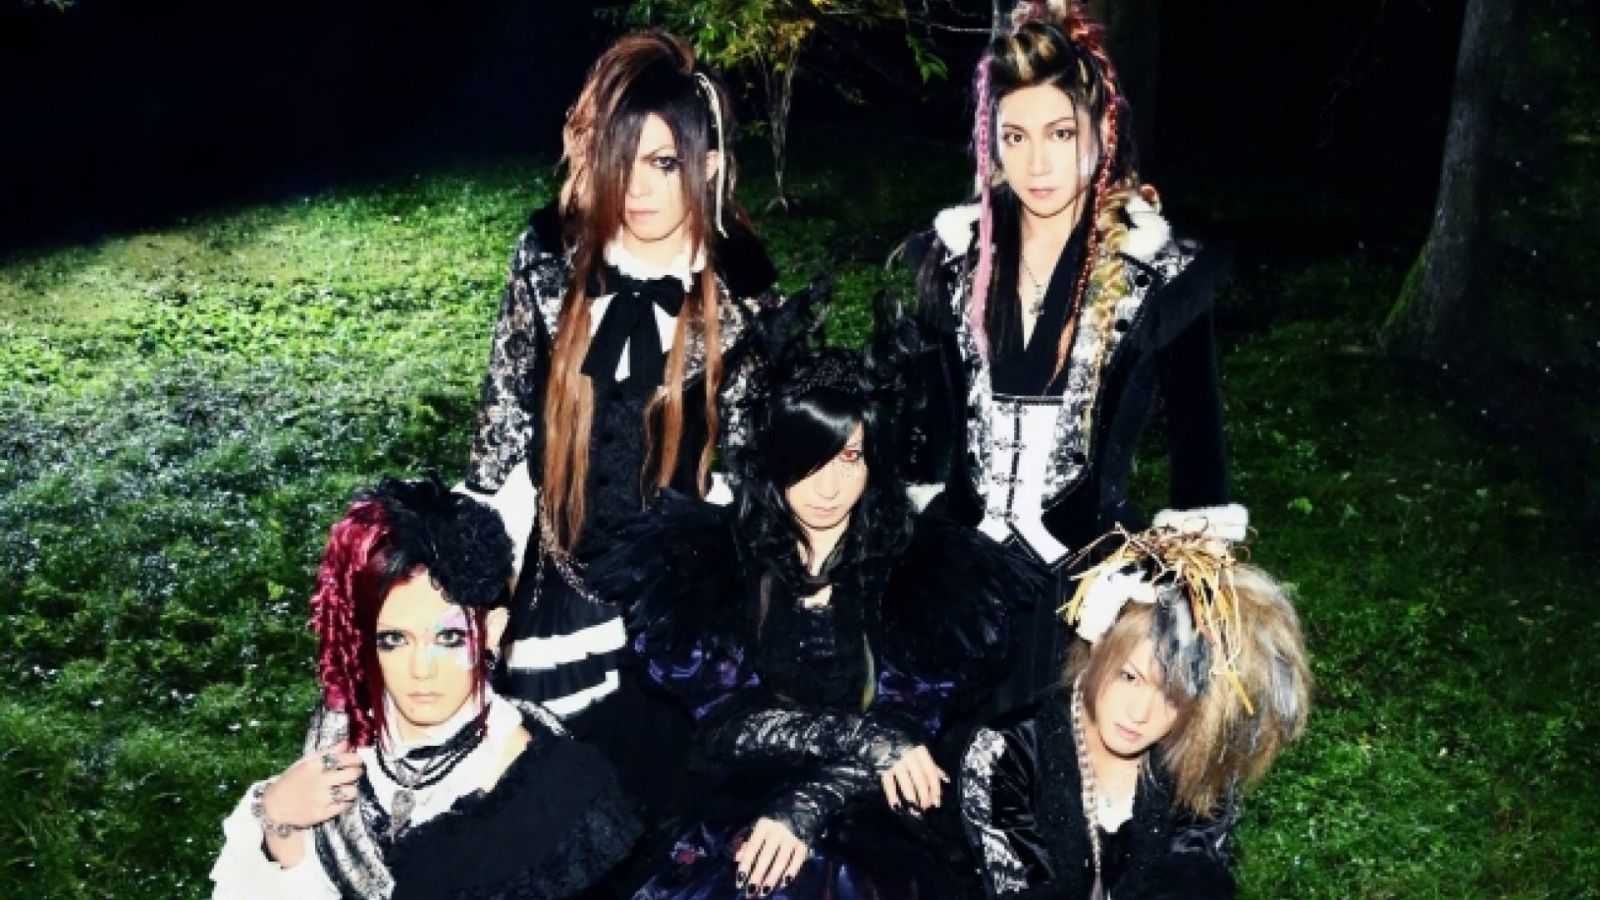 Тур D 'Namonaki mori no yumegatari': заключительный концерт 2012 года © D